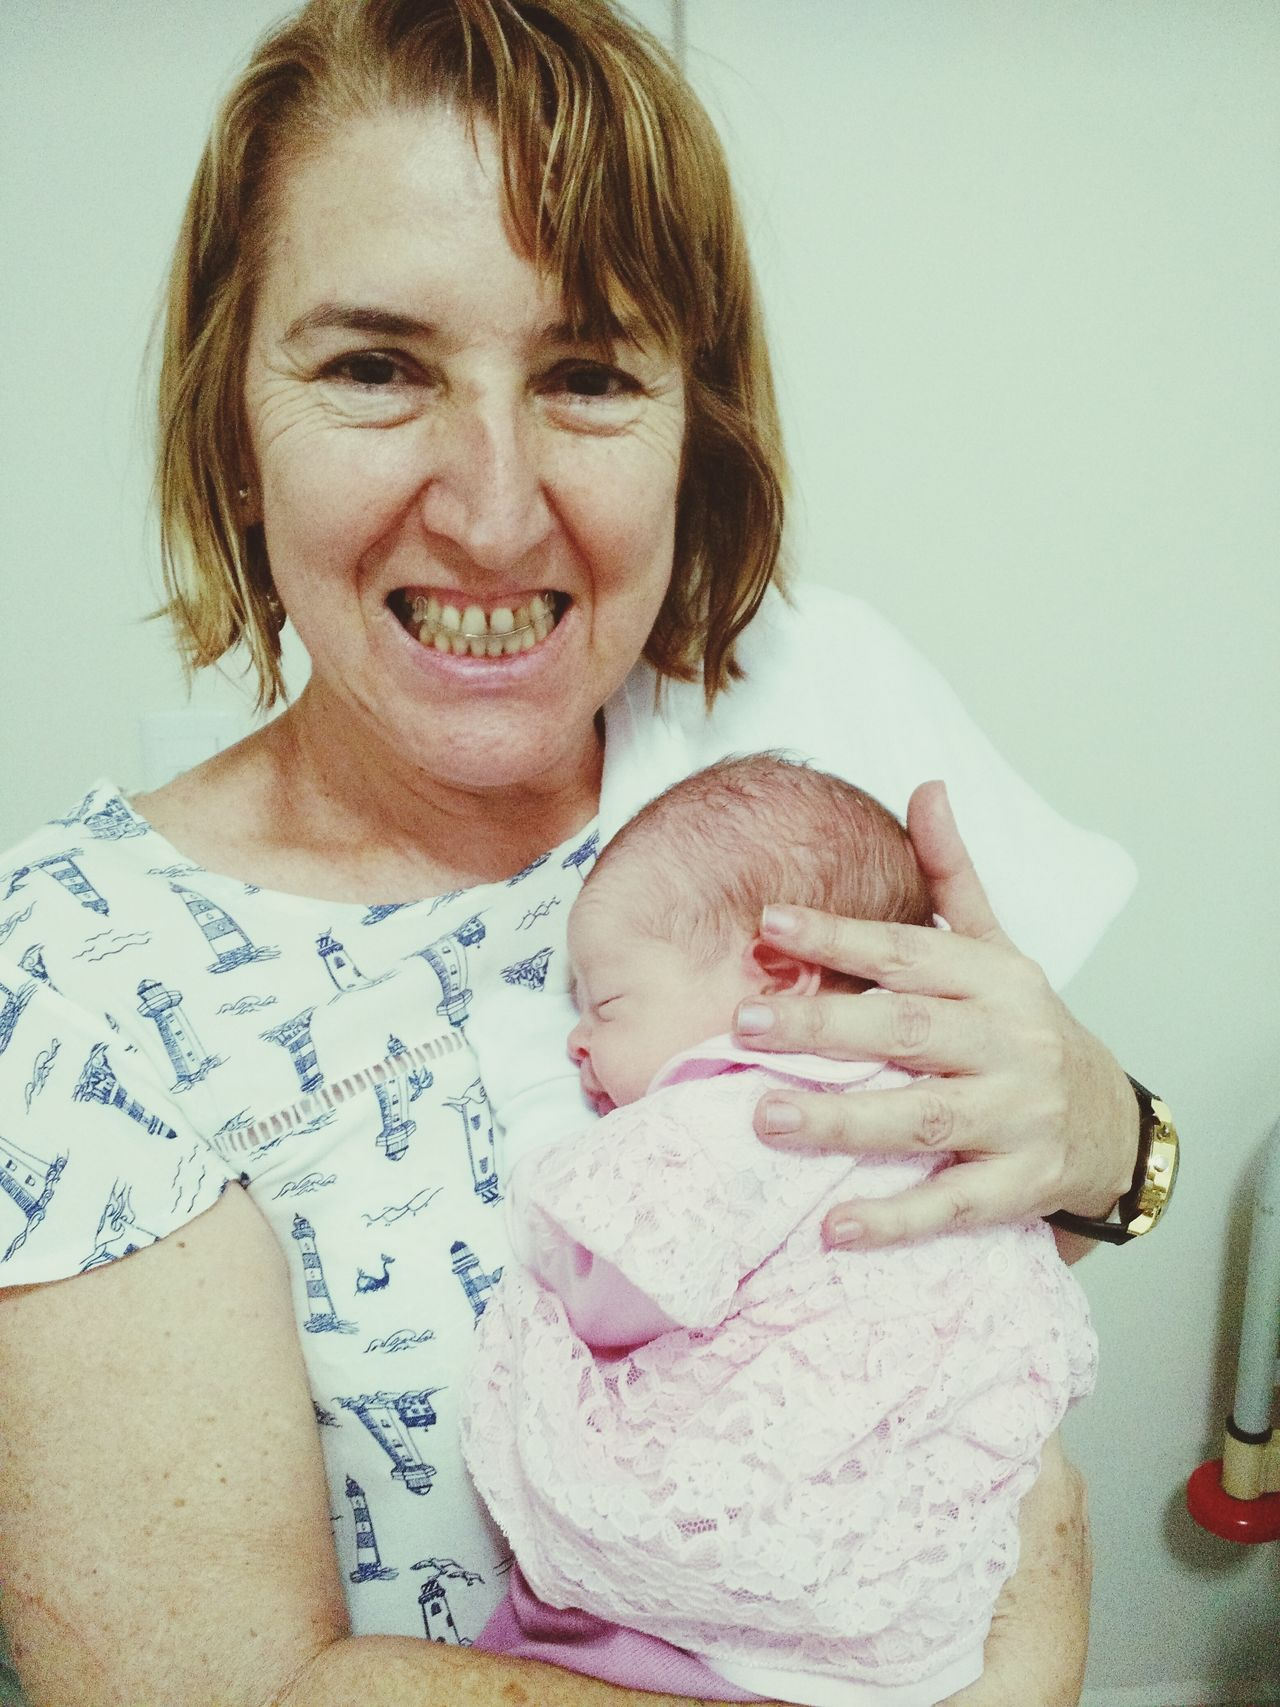 Baby Smiling Bebe Menina Recem Nascido Vovó❤️ Babona First Eyeem Photo Truelove Princesa ❤ Vida Netinha EyeEmNewHere